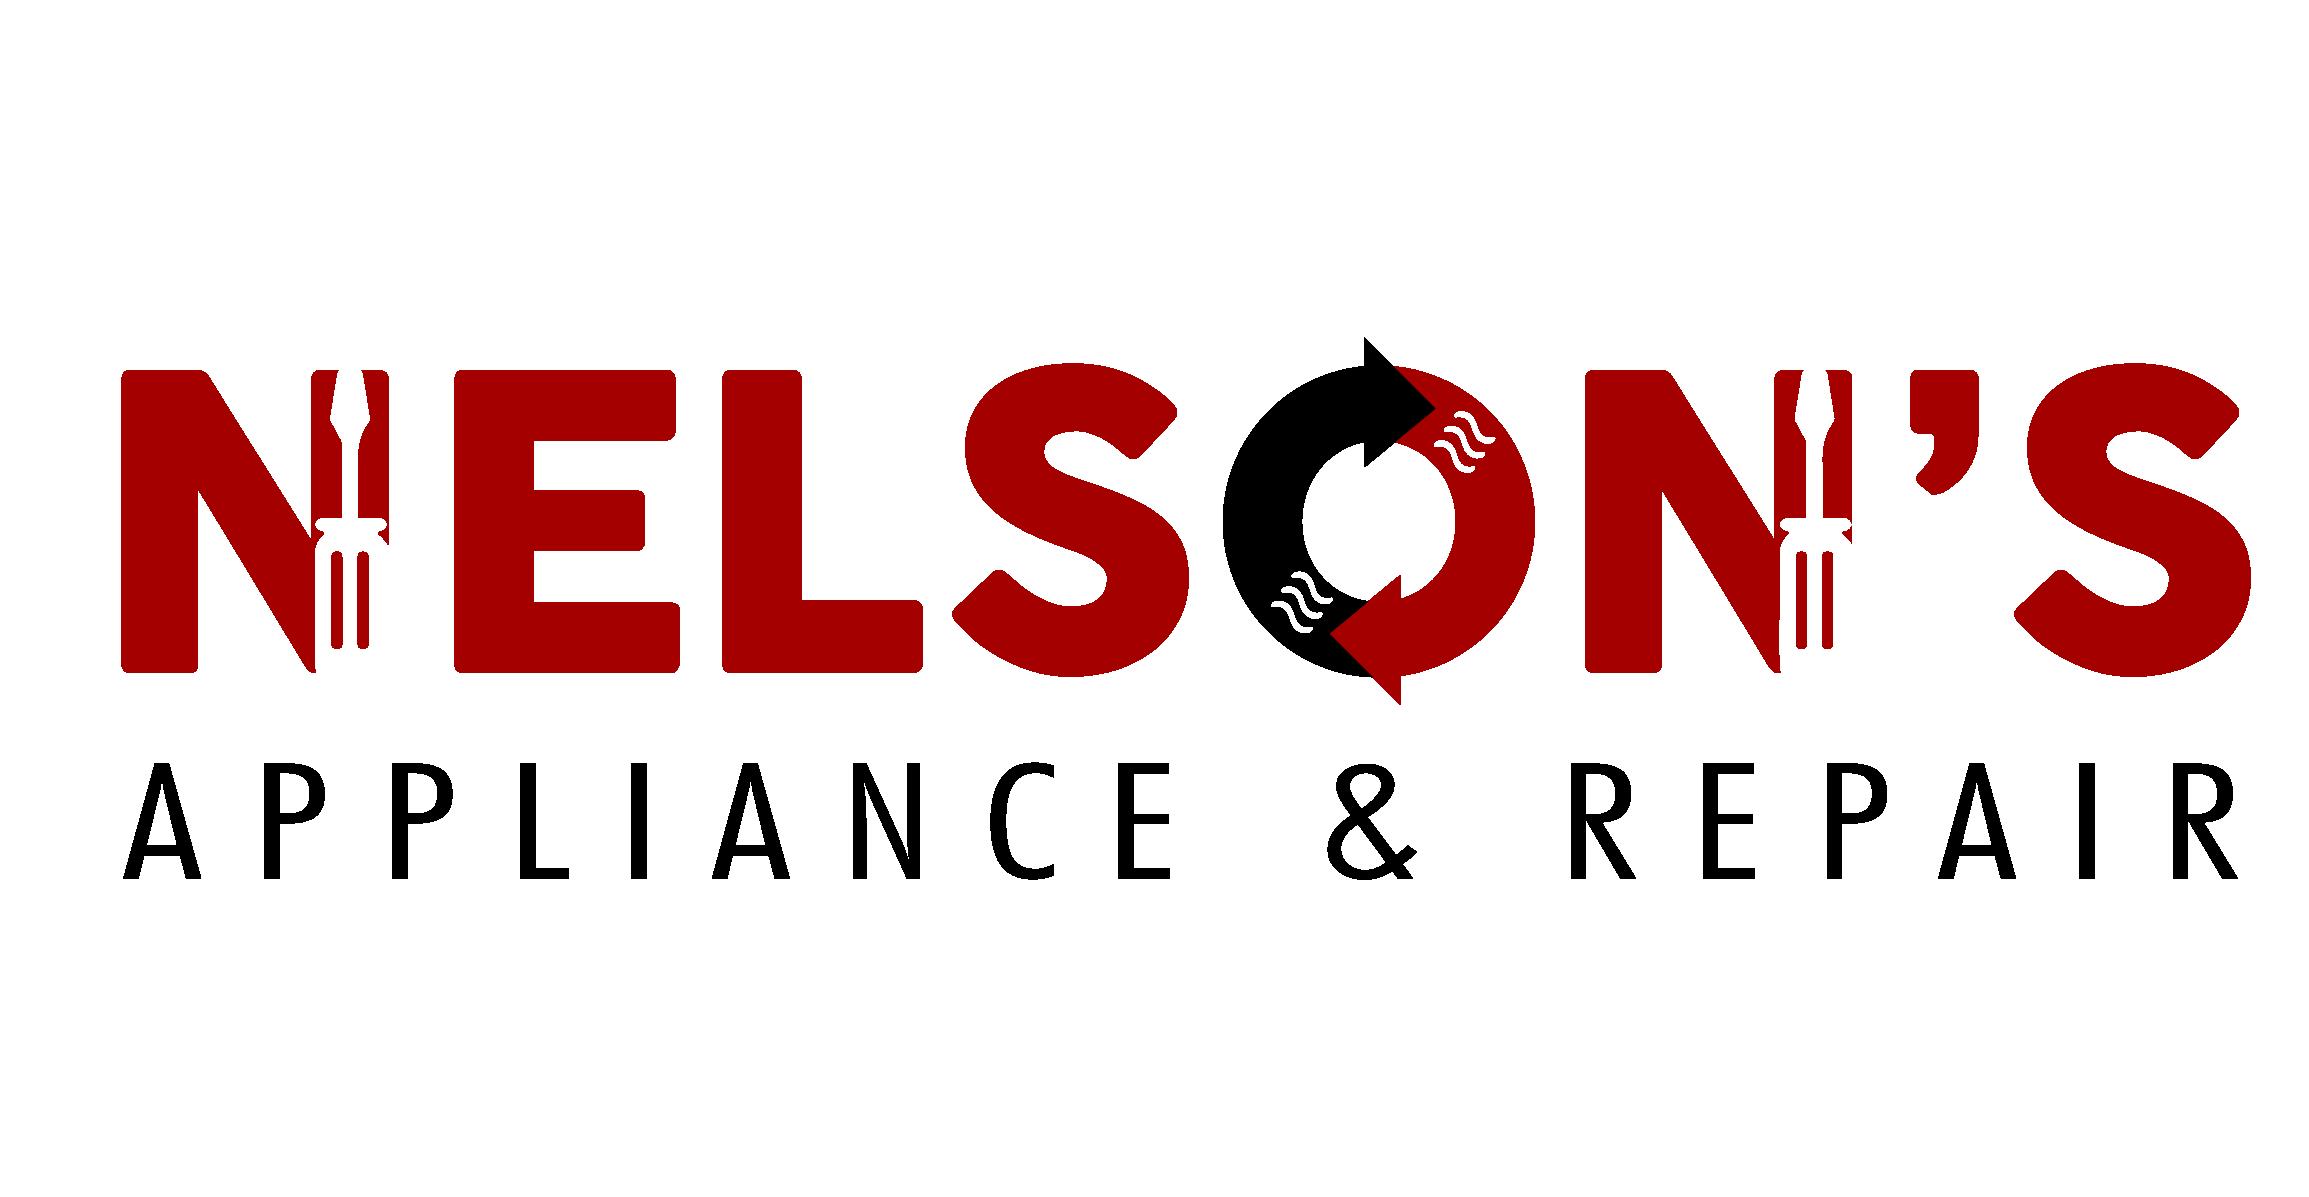 Nelson's Appliance & Repair